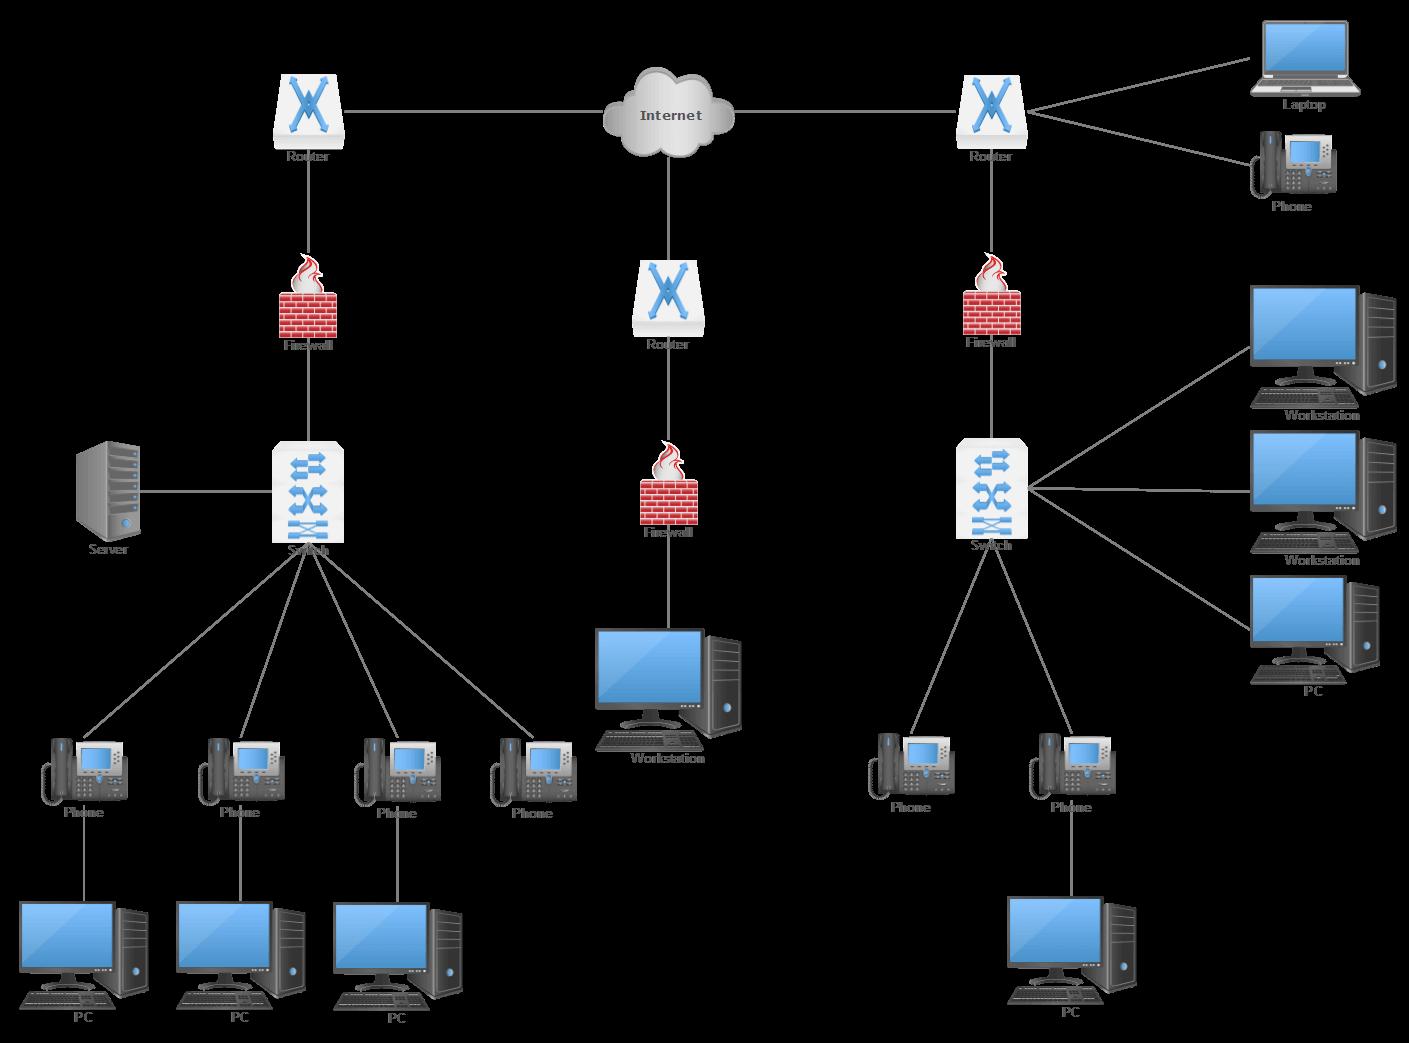 Network Schematic Diagram Wiring Diagrams Block Of Computer Software Free Download Or Online Rh Smartdraw Com